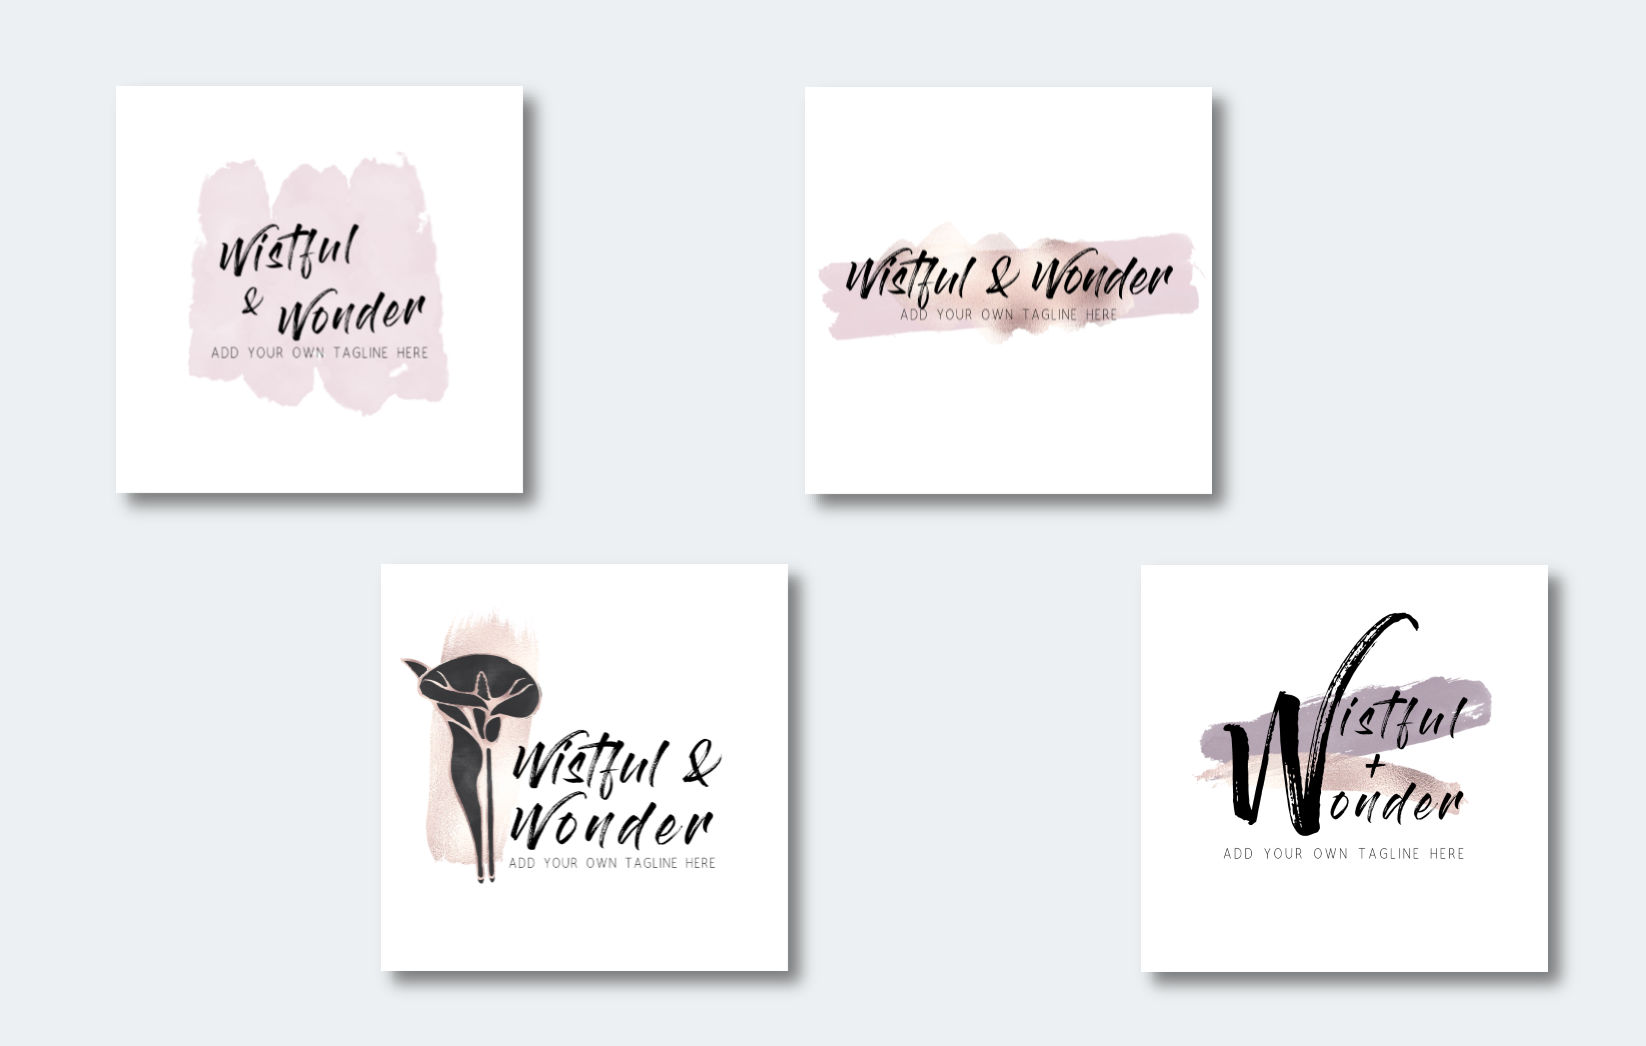 Wistful & Wonder Mega Canva Template Bundle 18